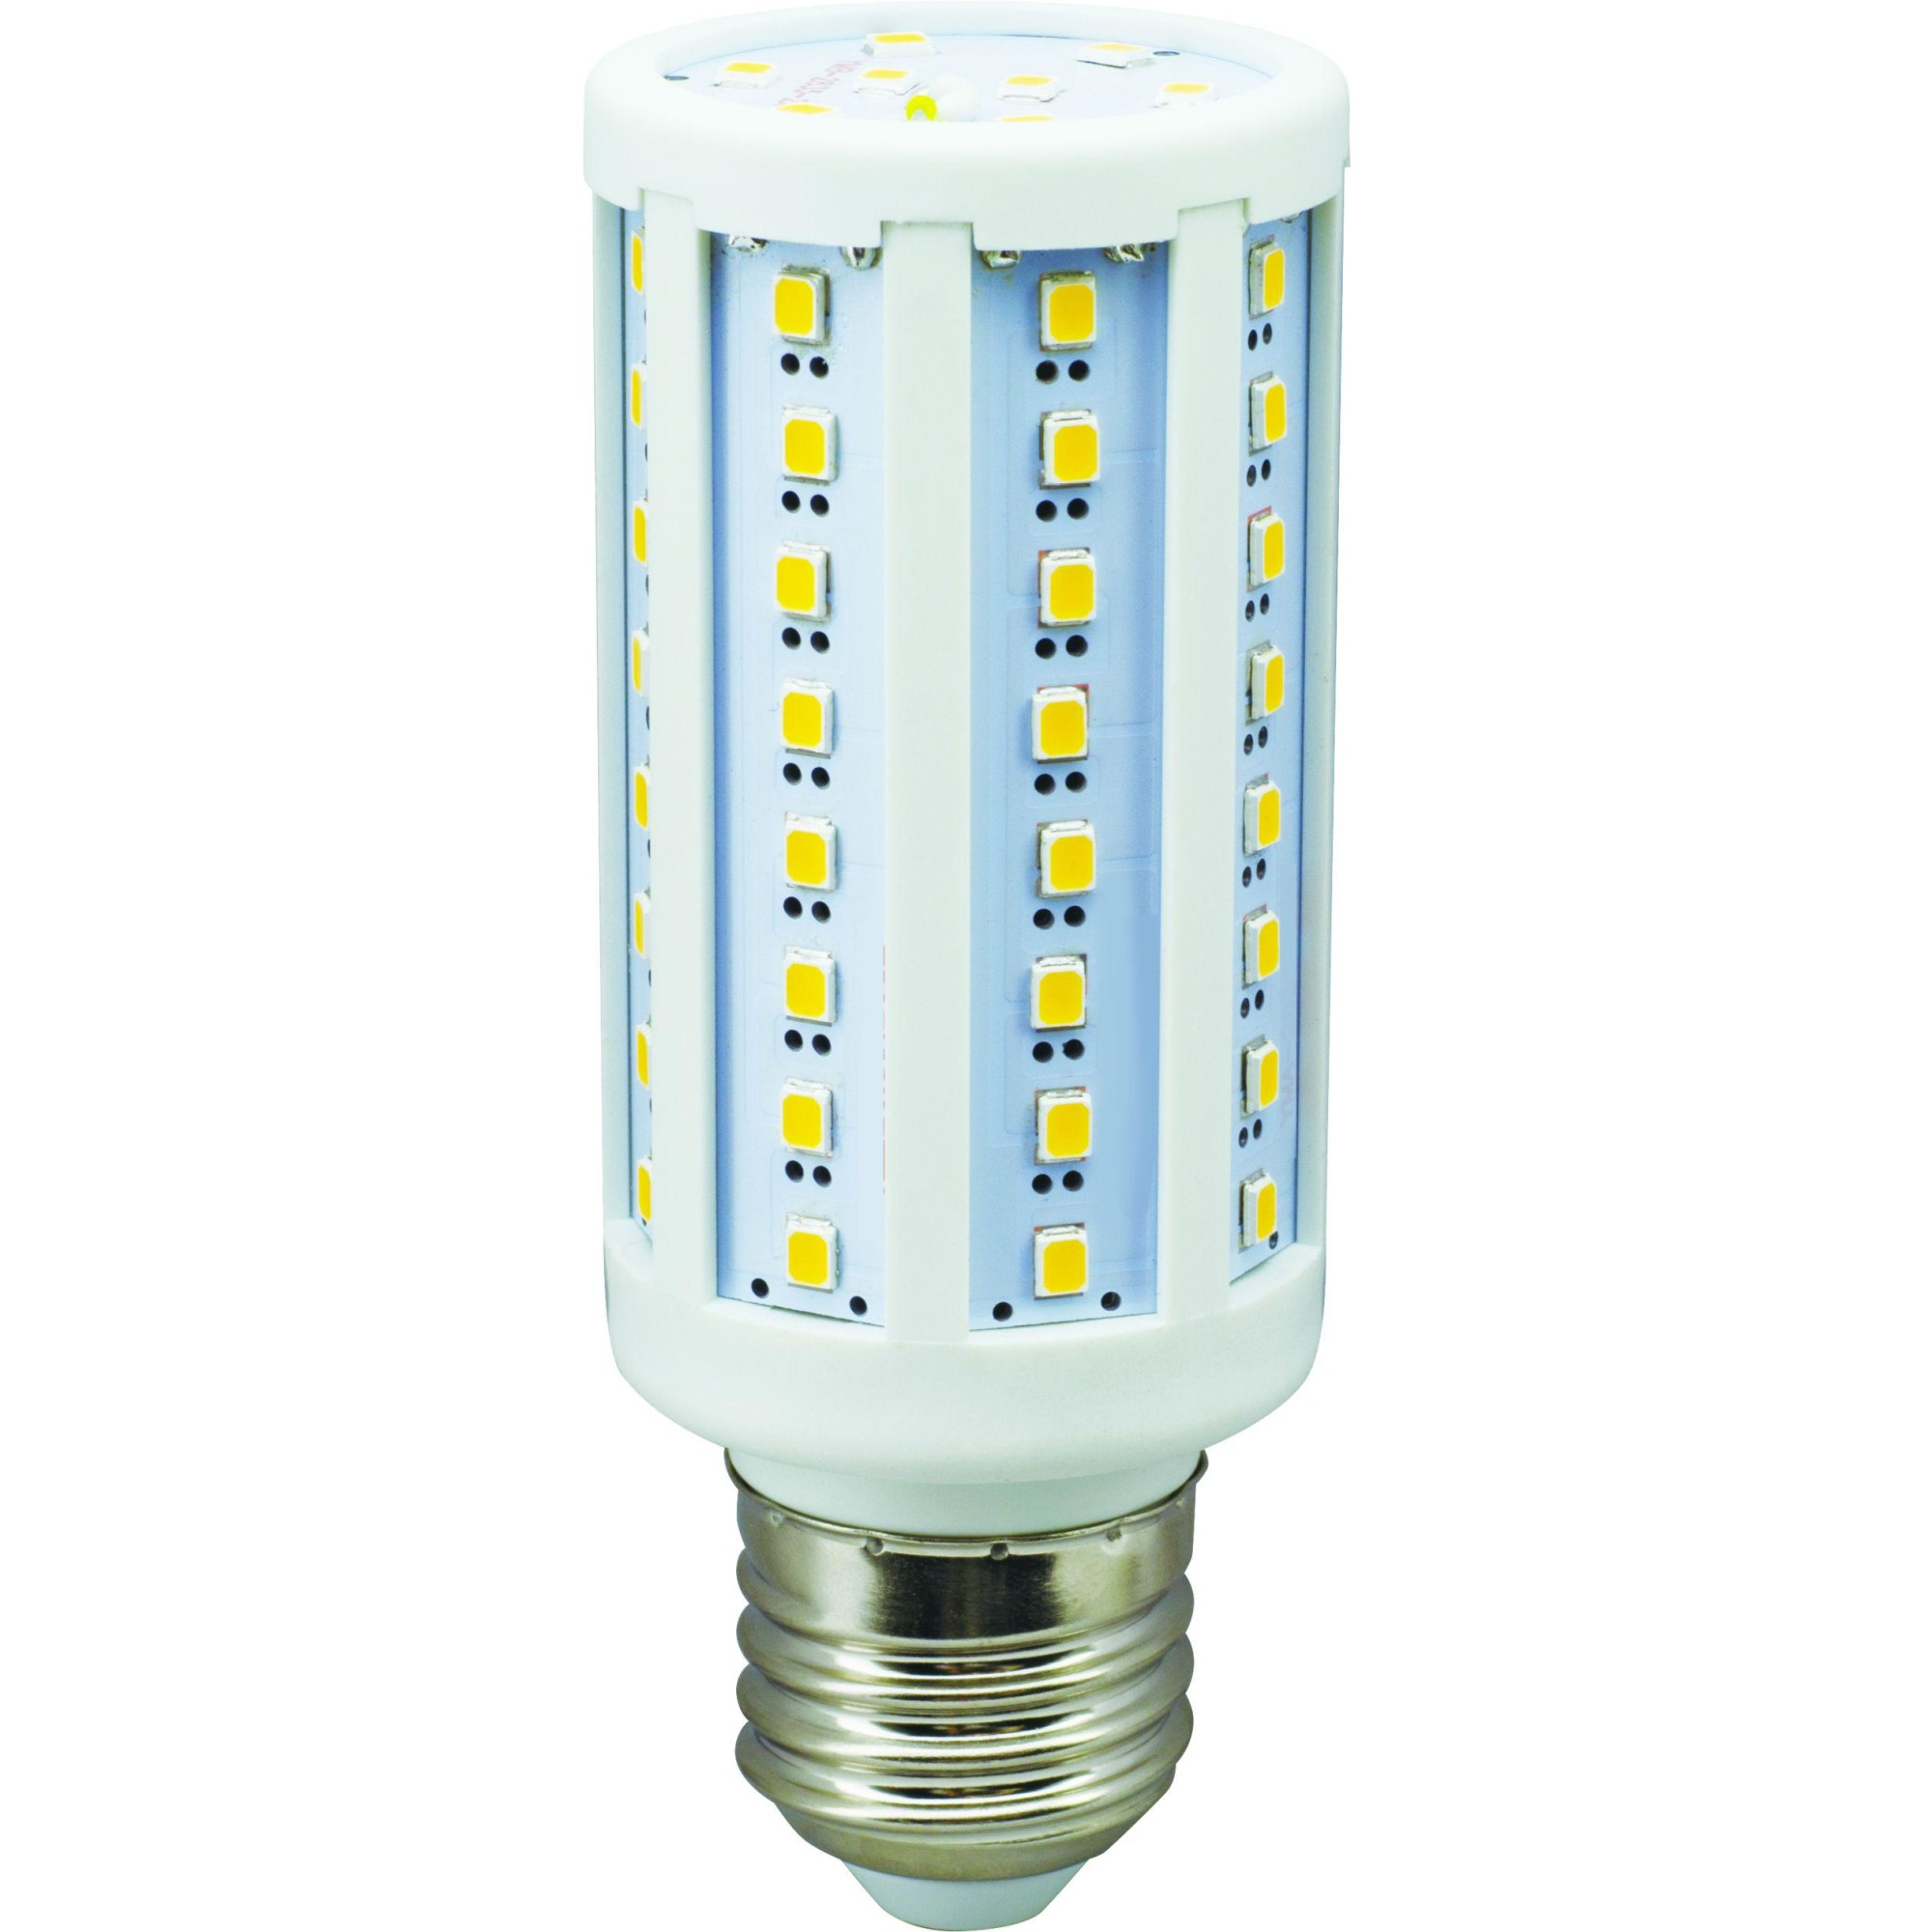 Лампа Ecola Premium светодионая E27 12 Вт кукуруза 1080 Лм холодный свет